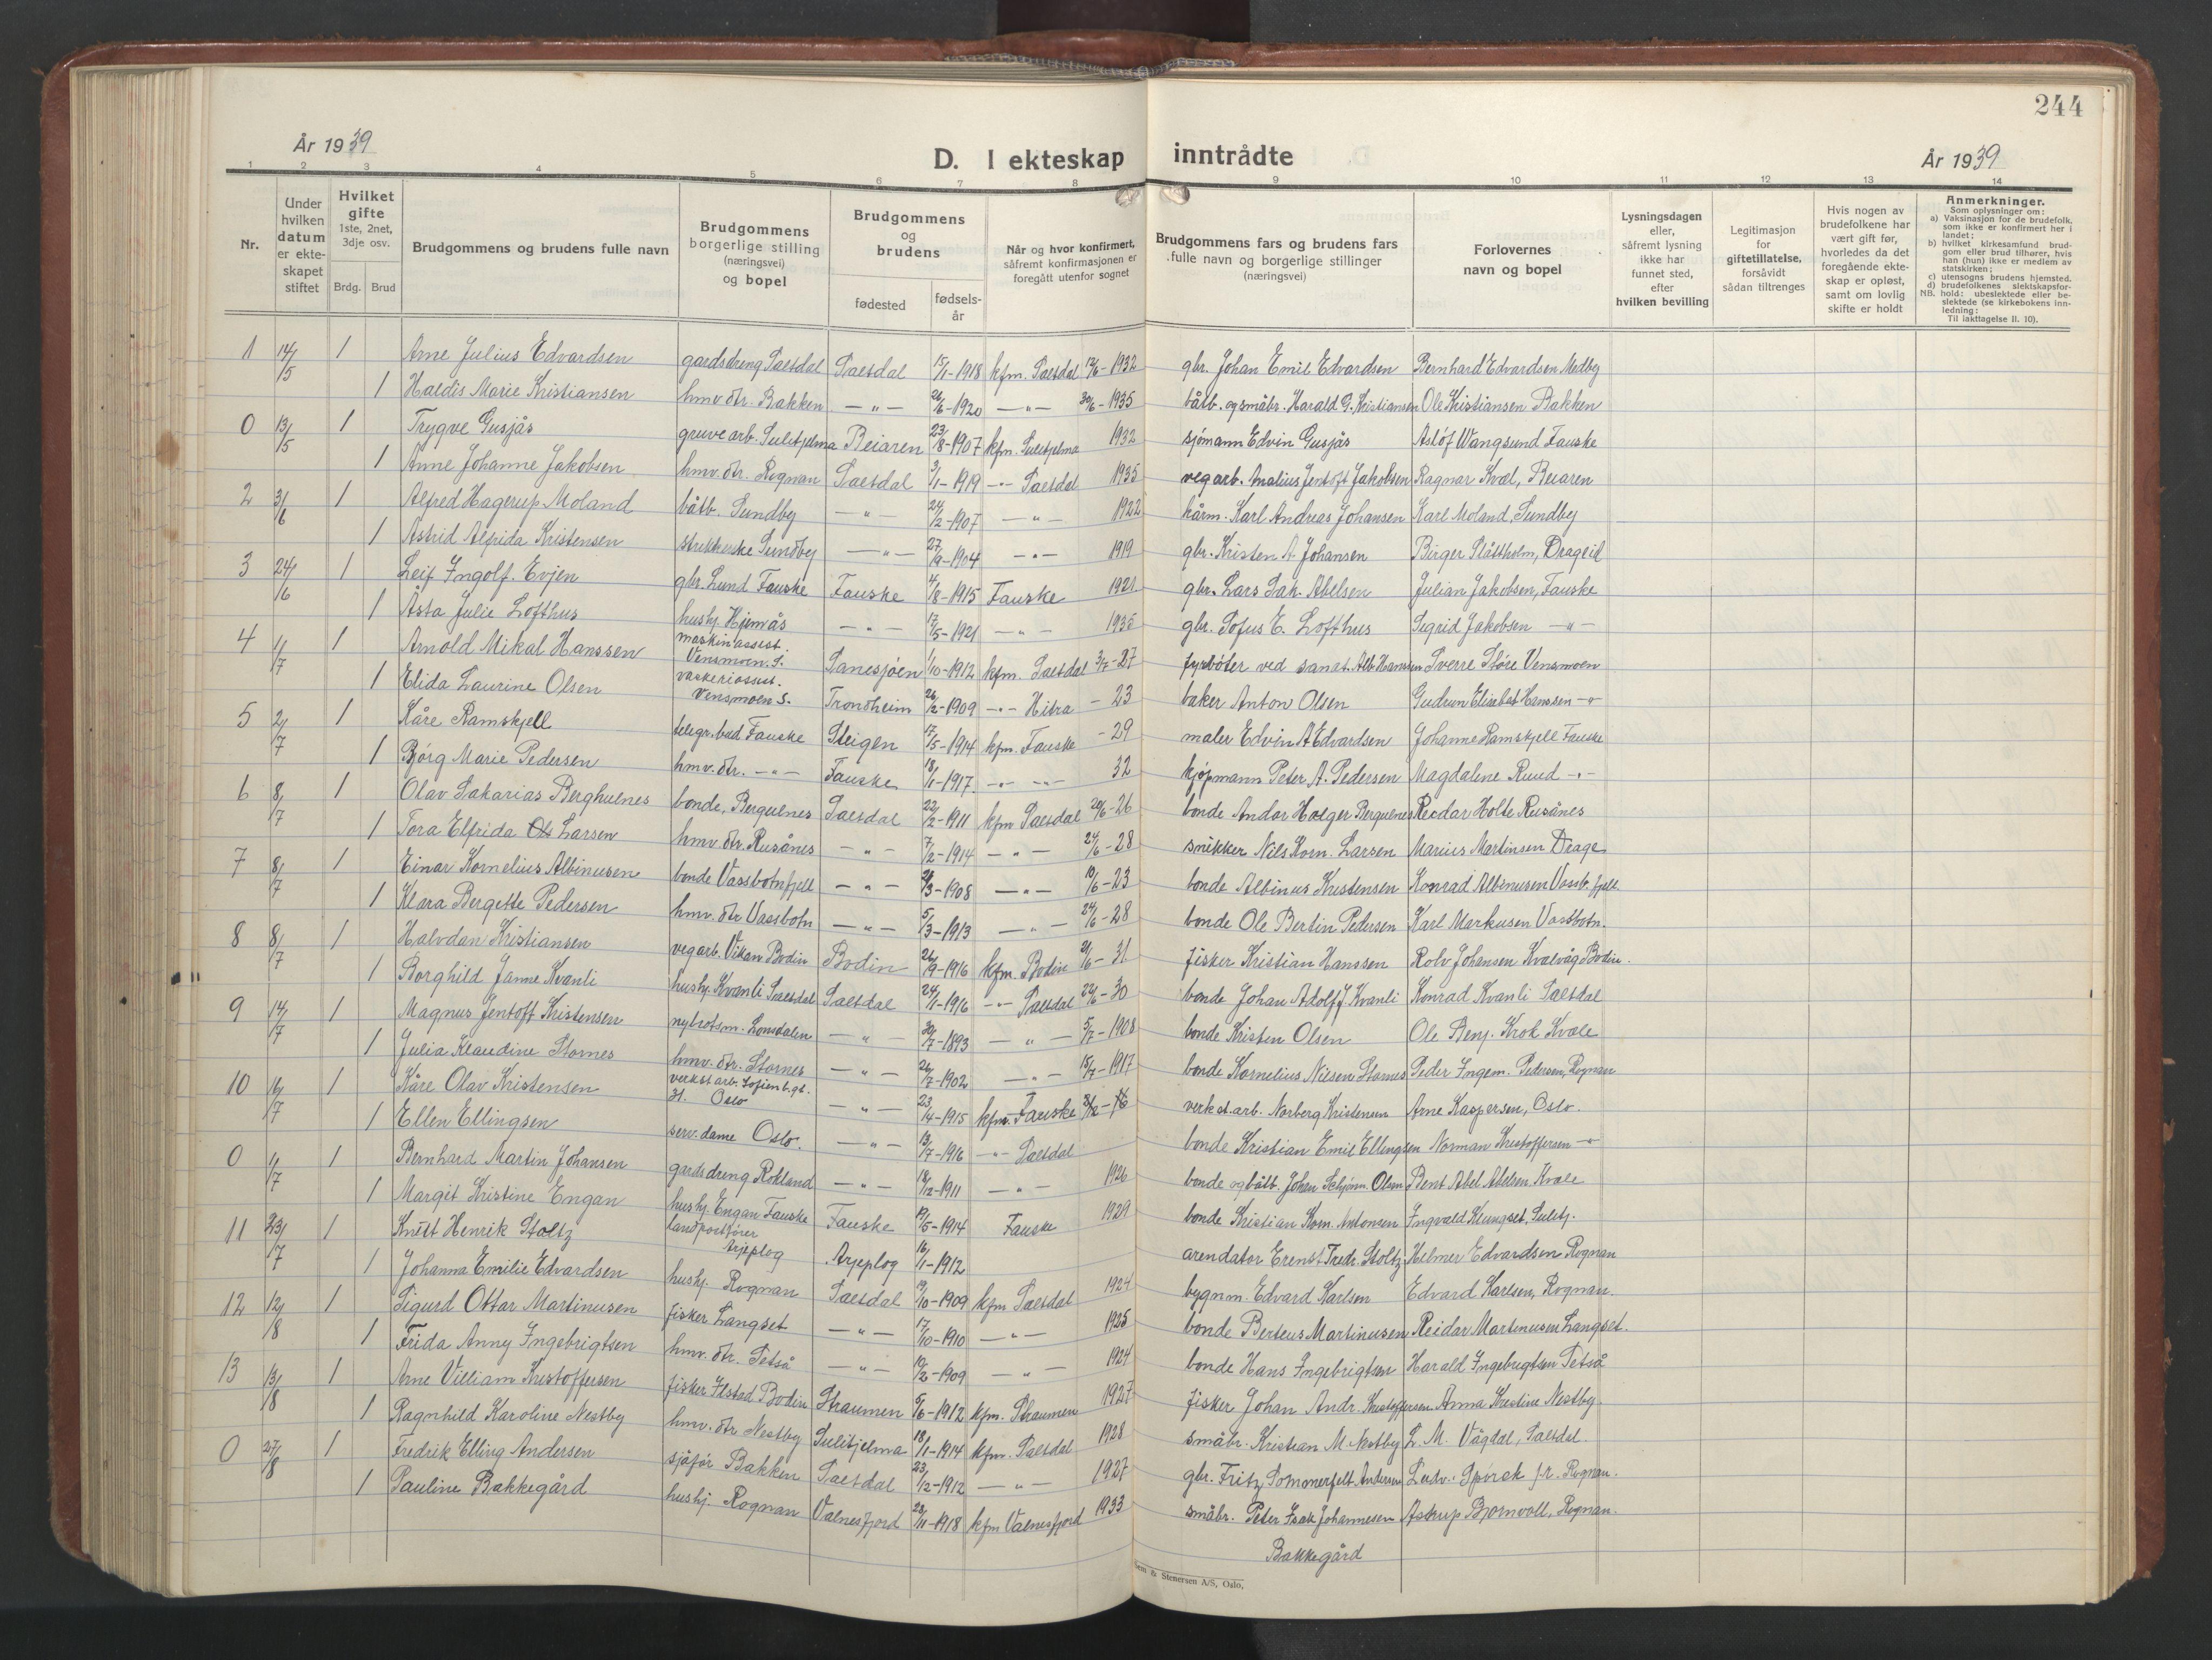 SAT, Ministerialprotokoller, klokkerbøker og fødselsregistre - Nordland, 847/L0680: Klokkerbok nr. 847C08, 1930-1947, s. 244